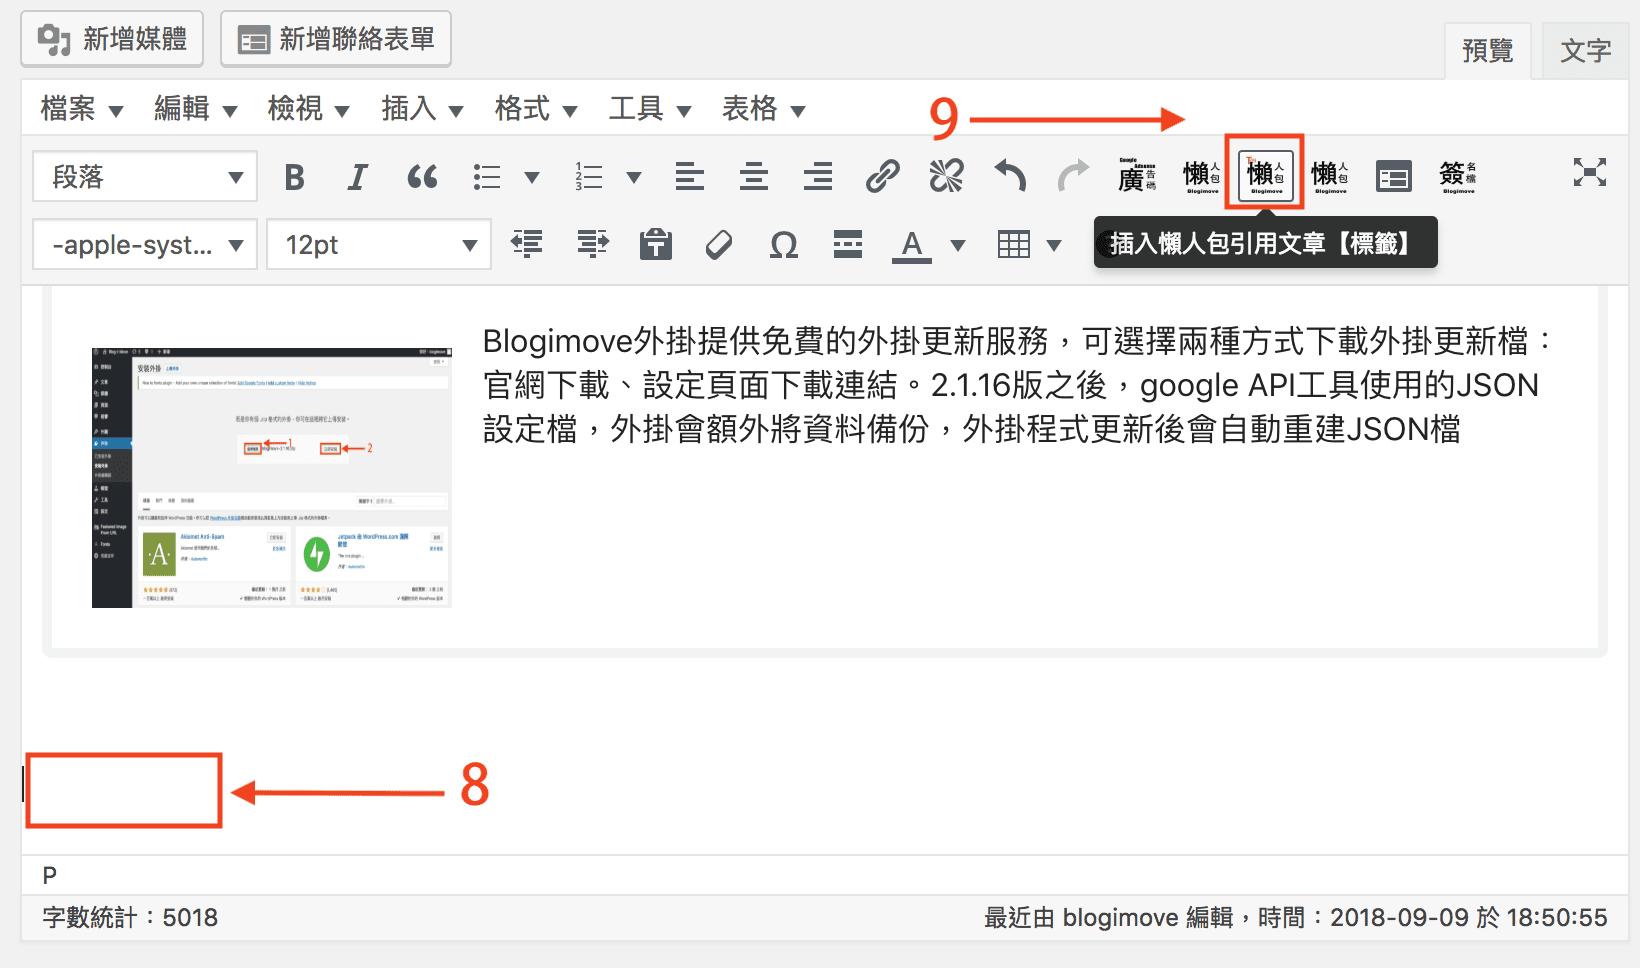 BLOGIMOVE外掛進階操作 | 懶人包應用【二】動態管理的簽名檔,改一篇所有簽名檔同步更新 @Blog-i-Move